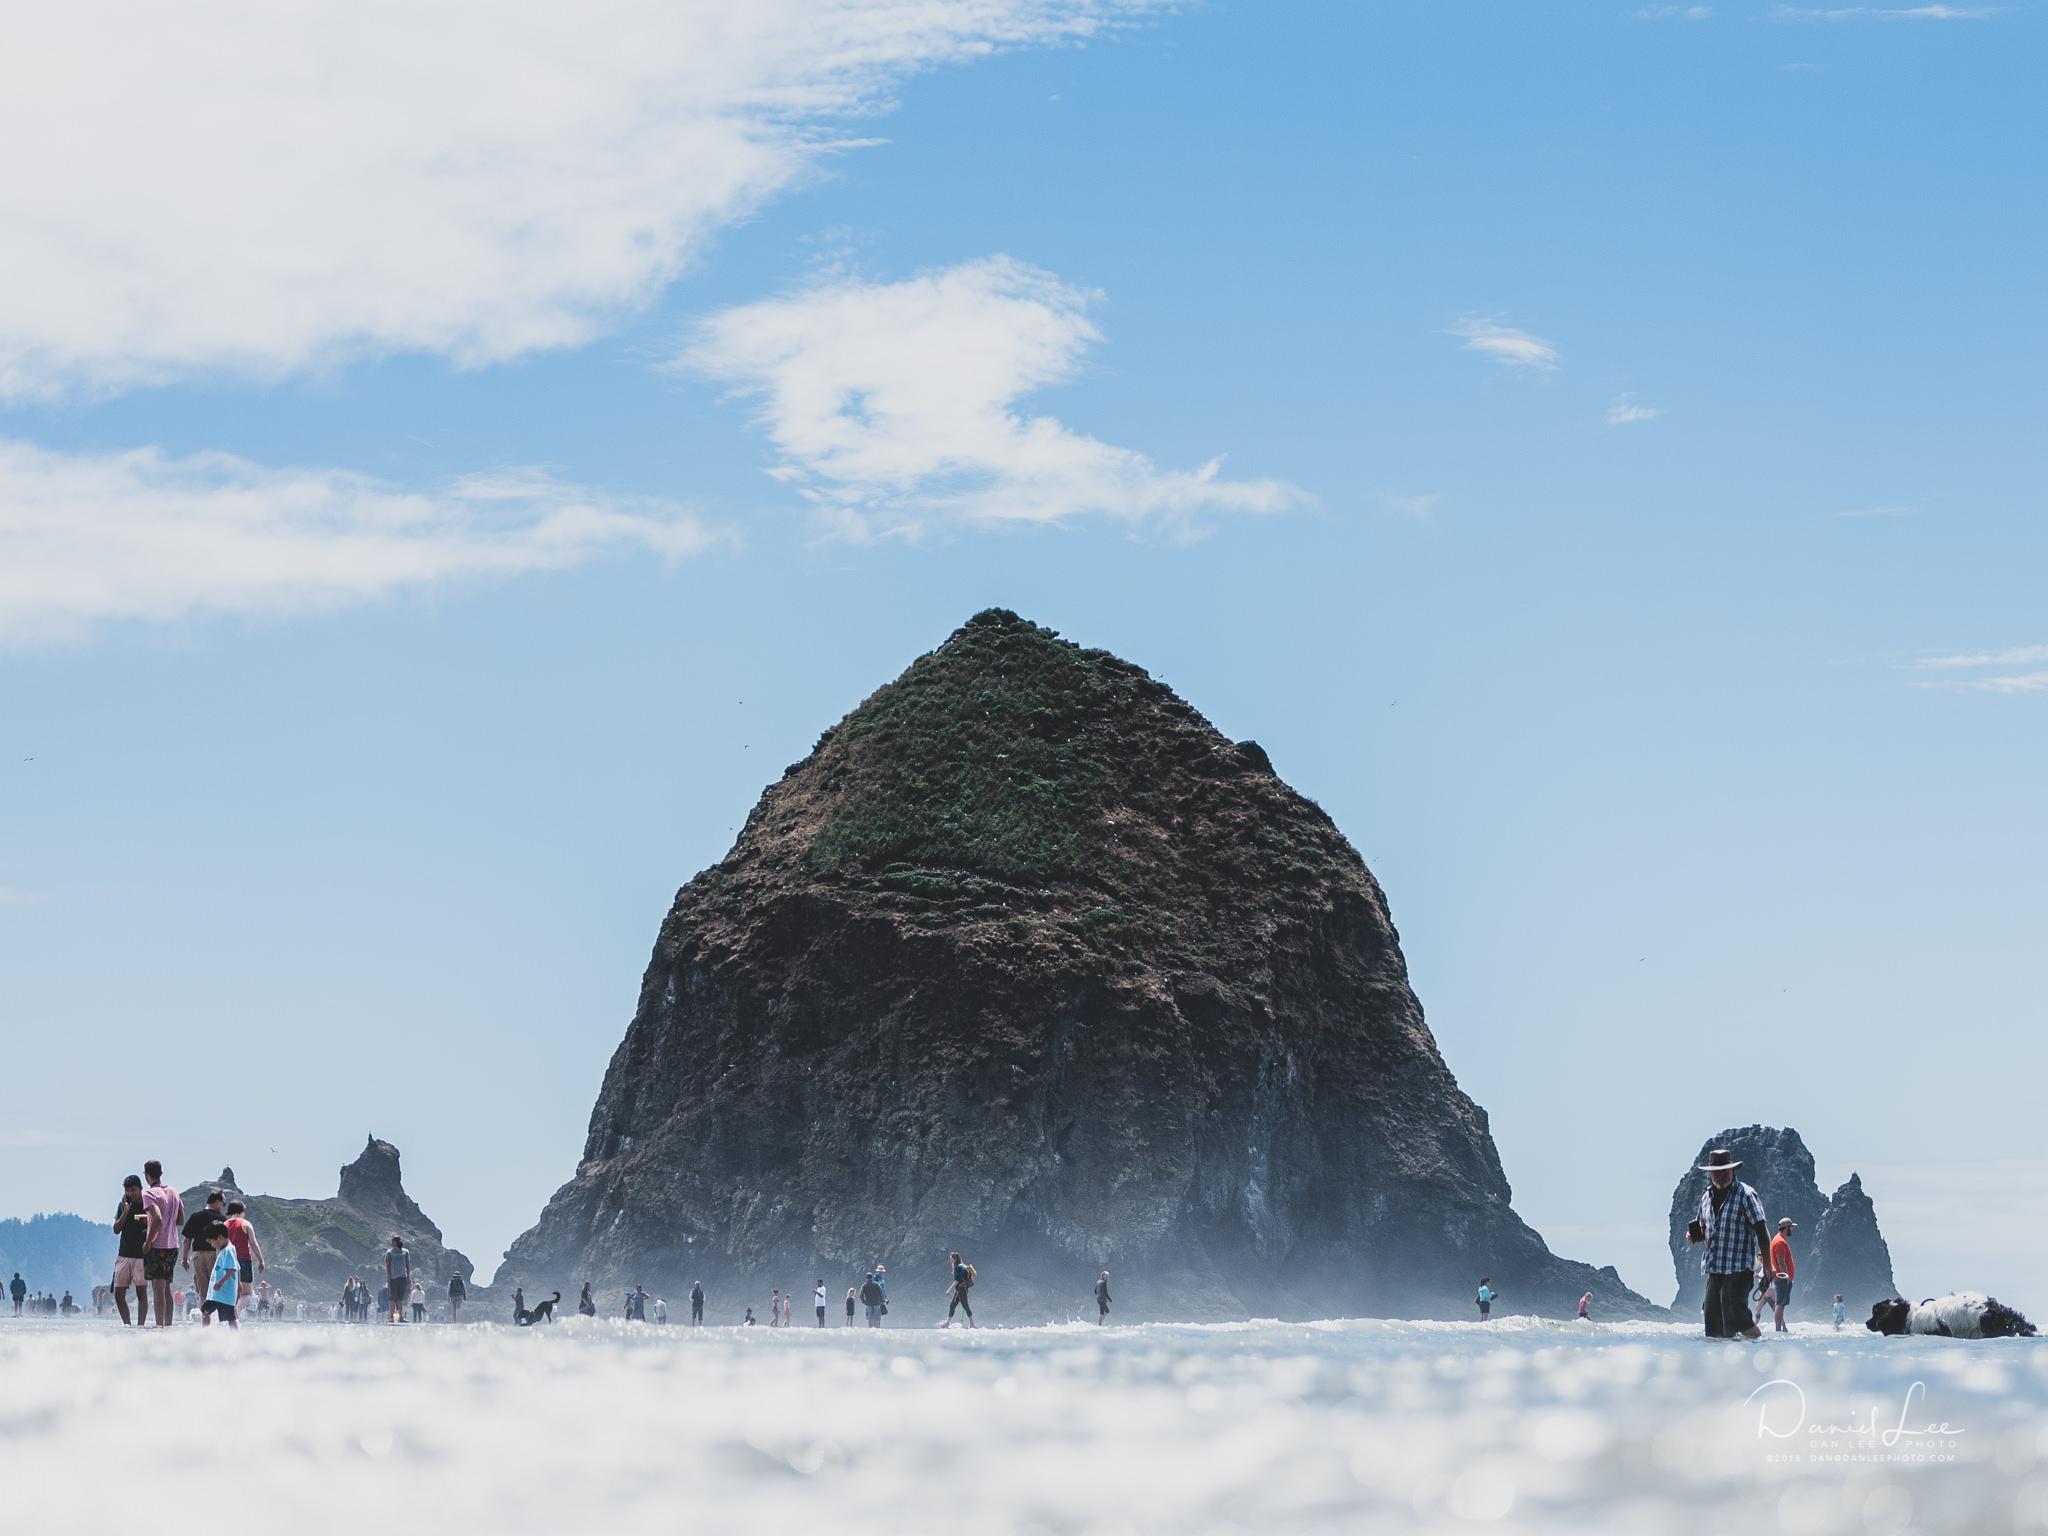 Haystack Hill, Cannon Beach, Oregon. Photo by Daniel Lee.